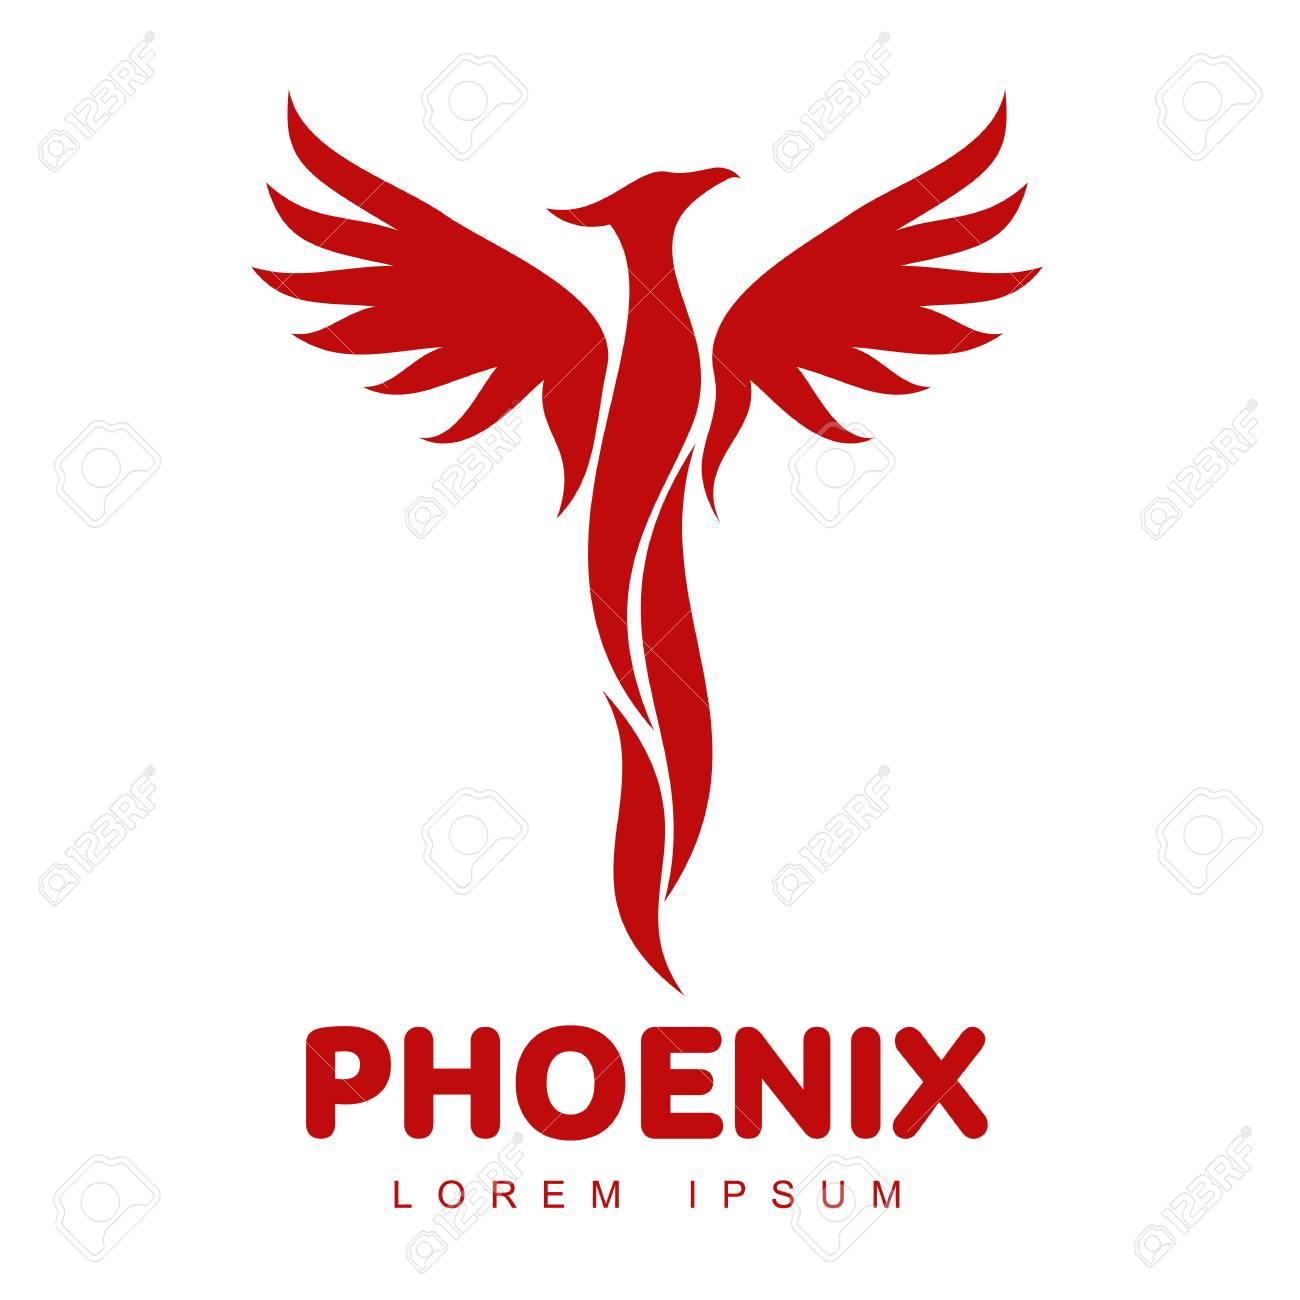 stylized graphic phoenix bird logo templates collection of creative rh 123rf com phoenix bird logo hd phoenix bird logo free